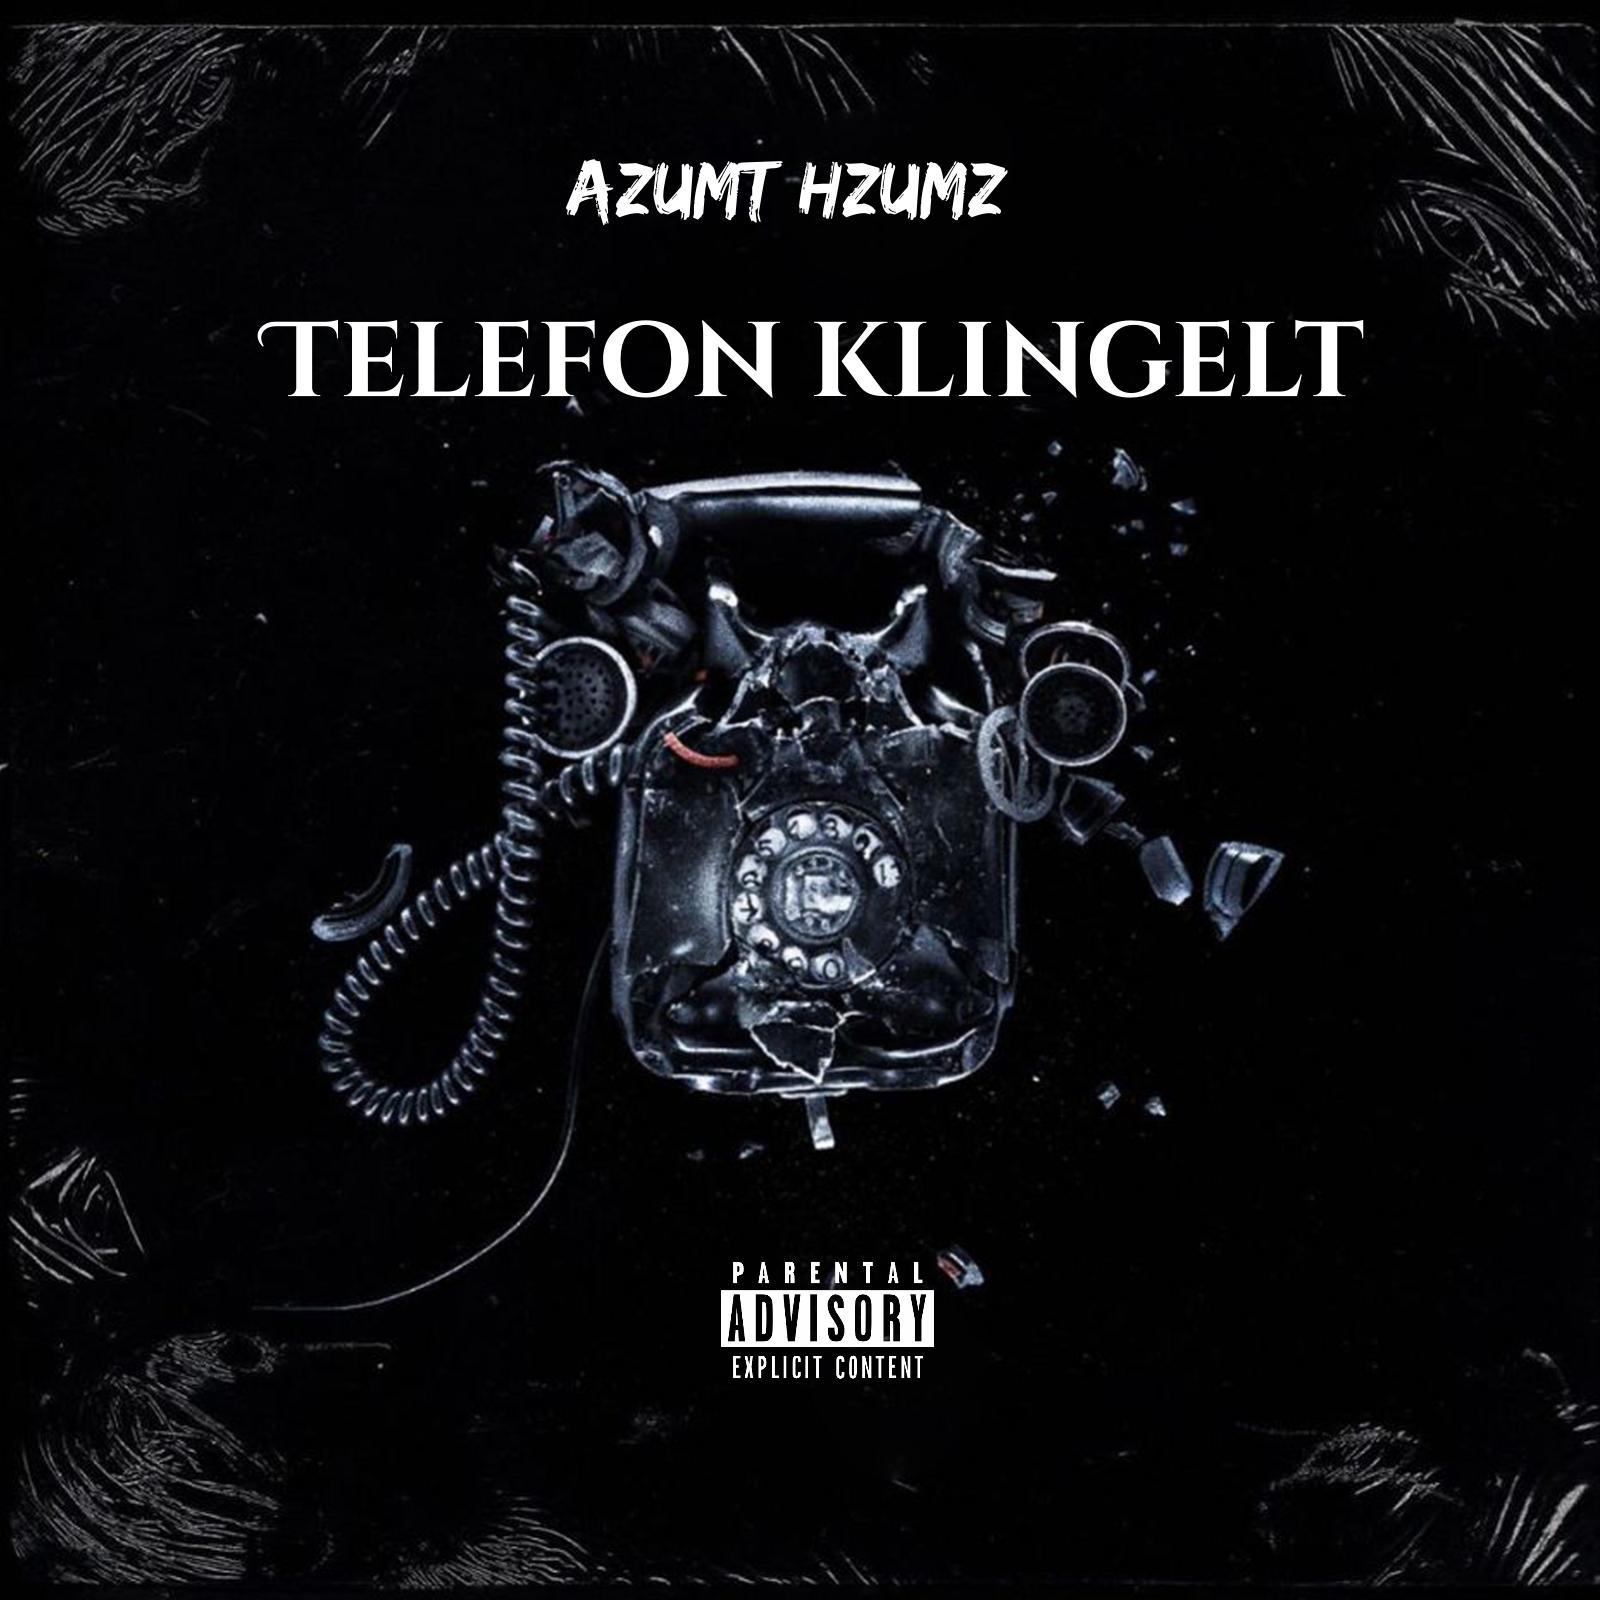 Upcoming: AzumT&HzumZ - Telefon Klingelt